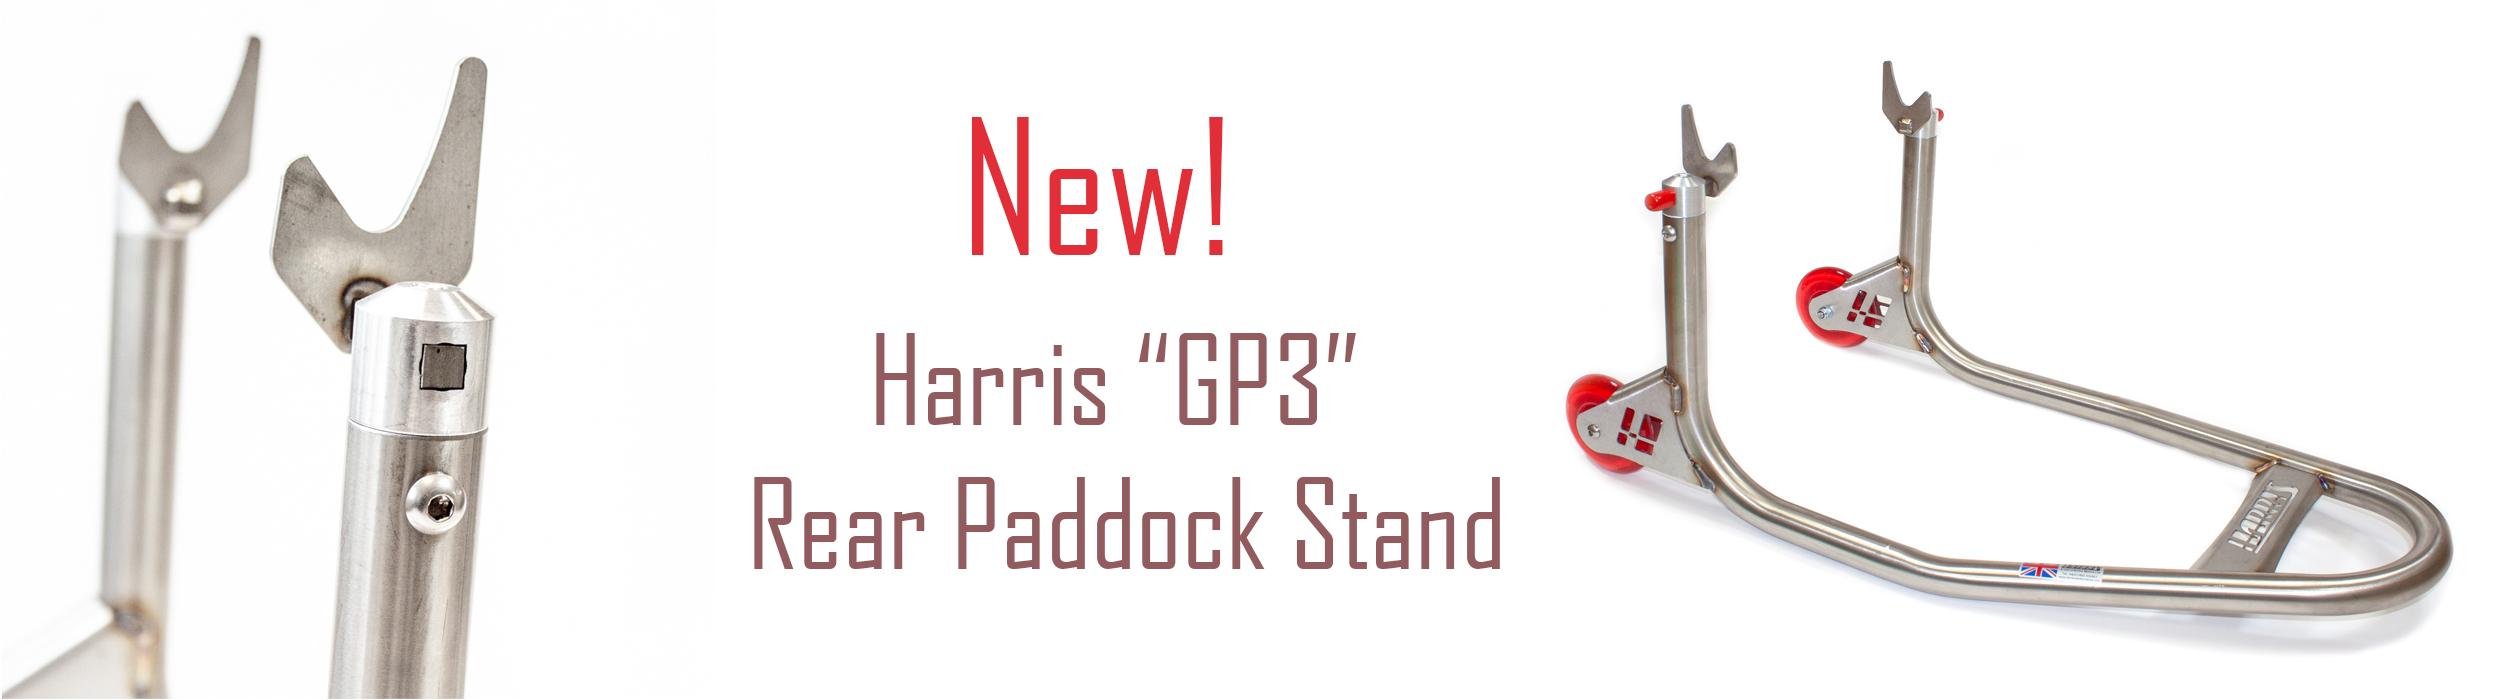 "Harris Stainless Steel ""GP3"" Rear Paddock Stand"